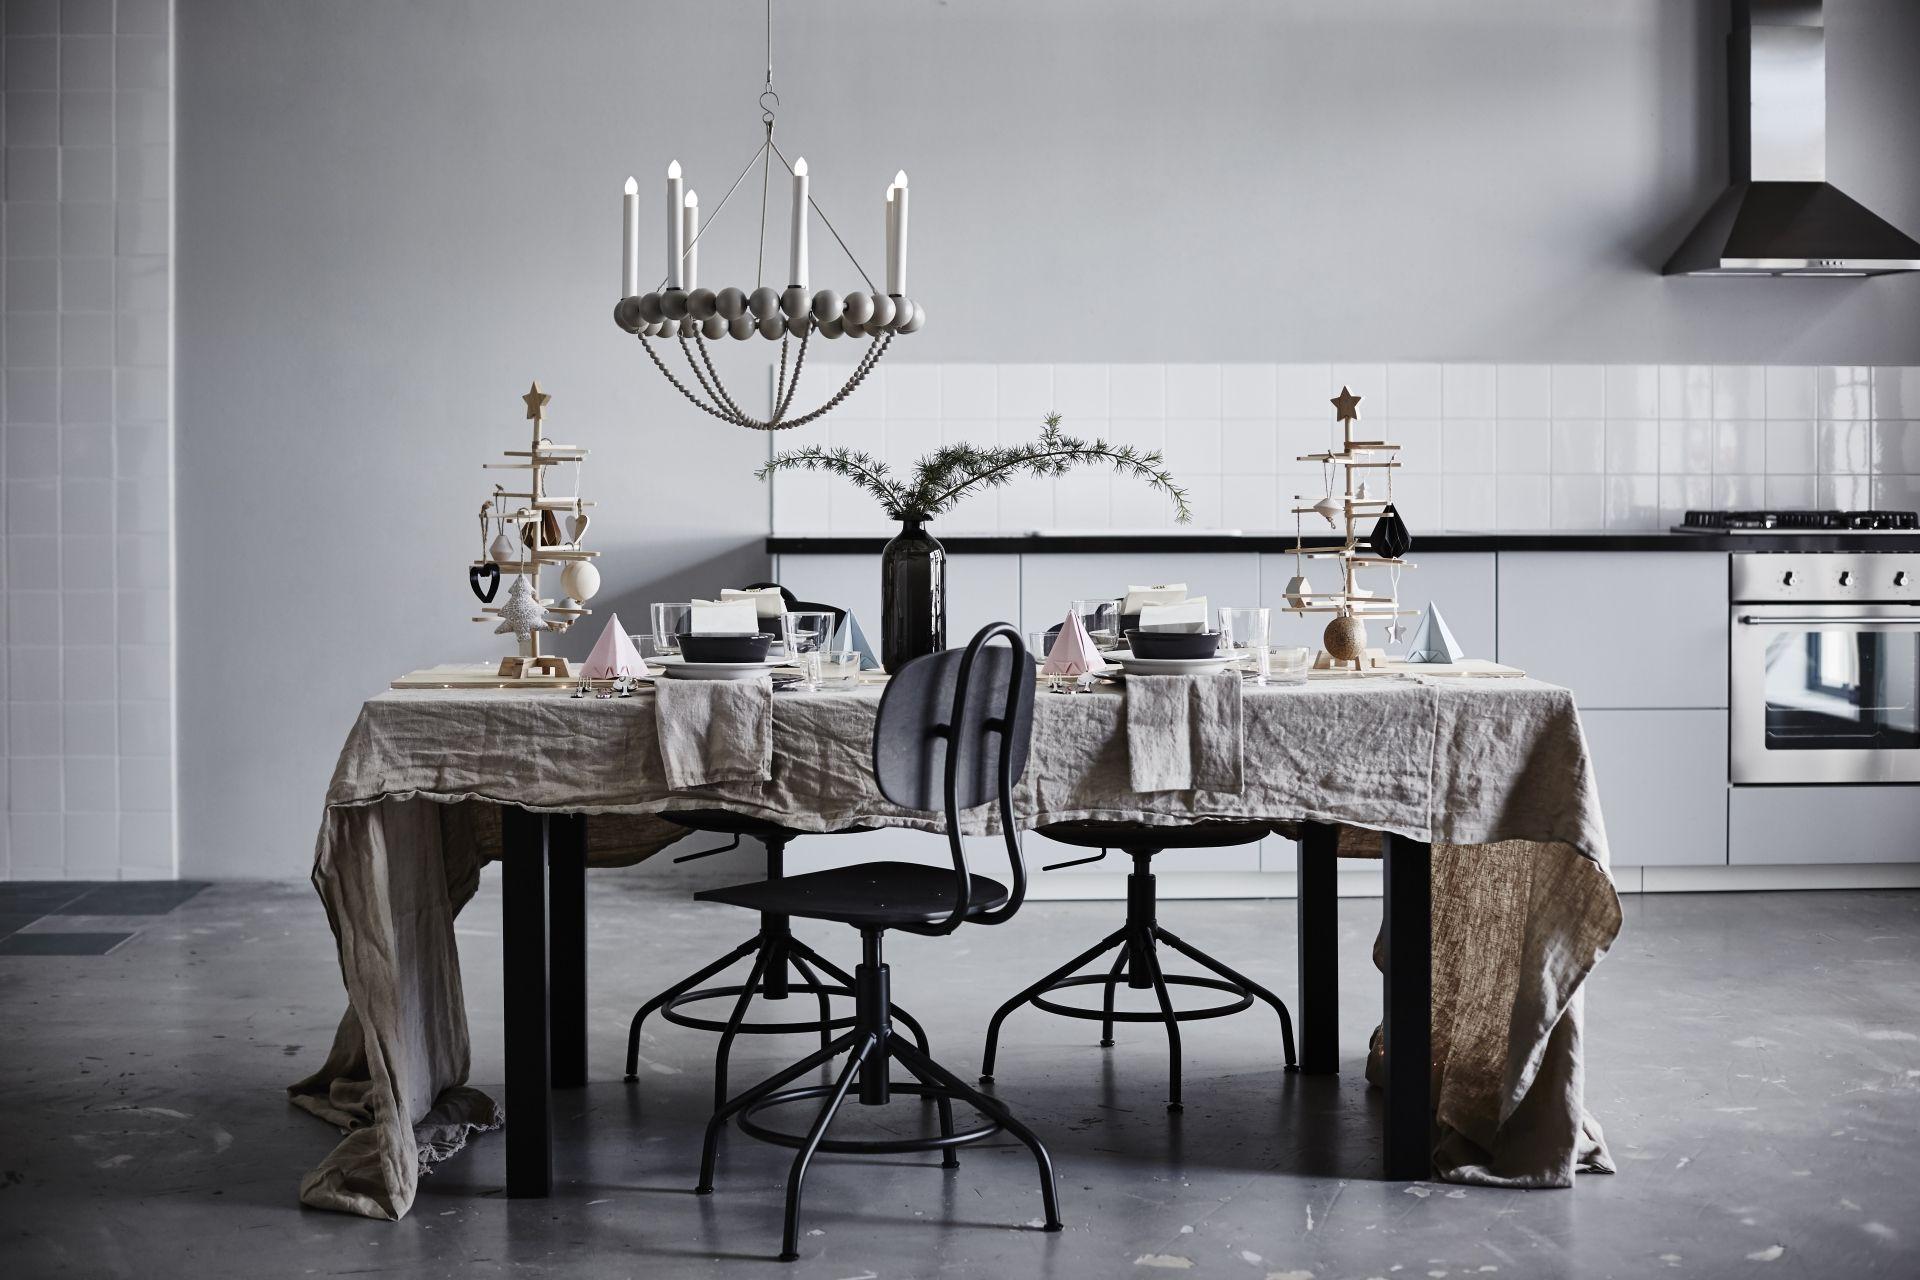 KULLABERG Bureaustoel, zwart | Dining area, Kitchens and Room